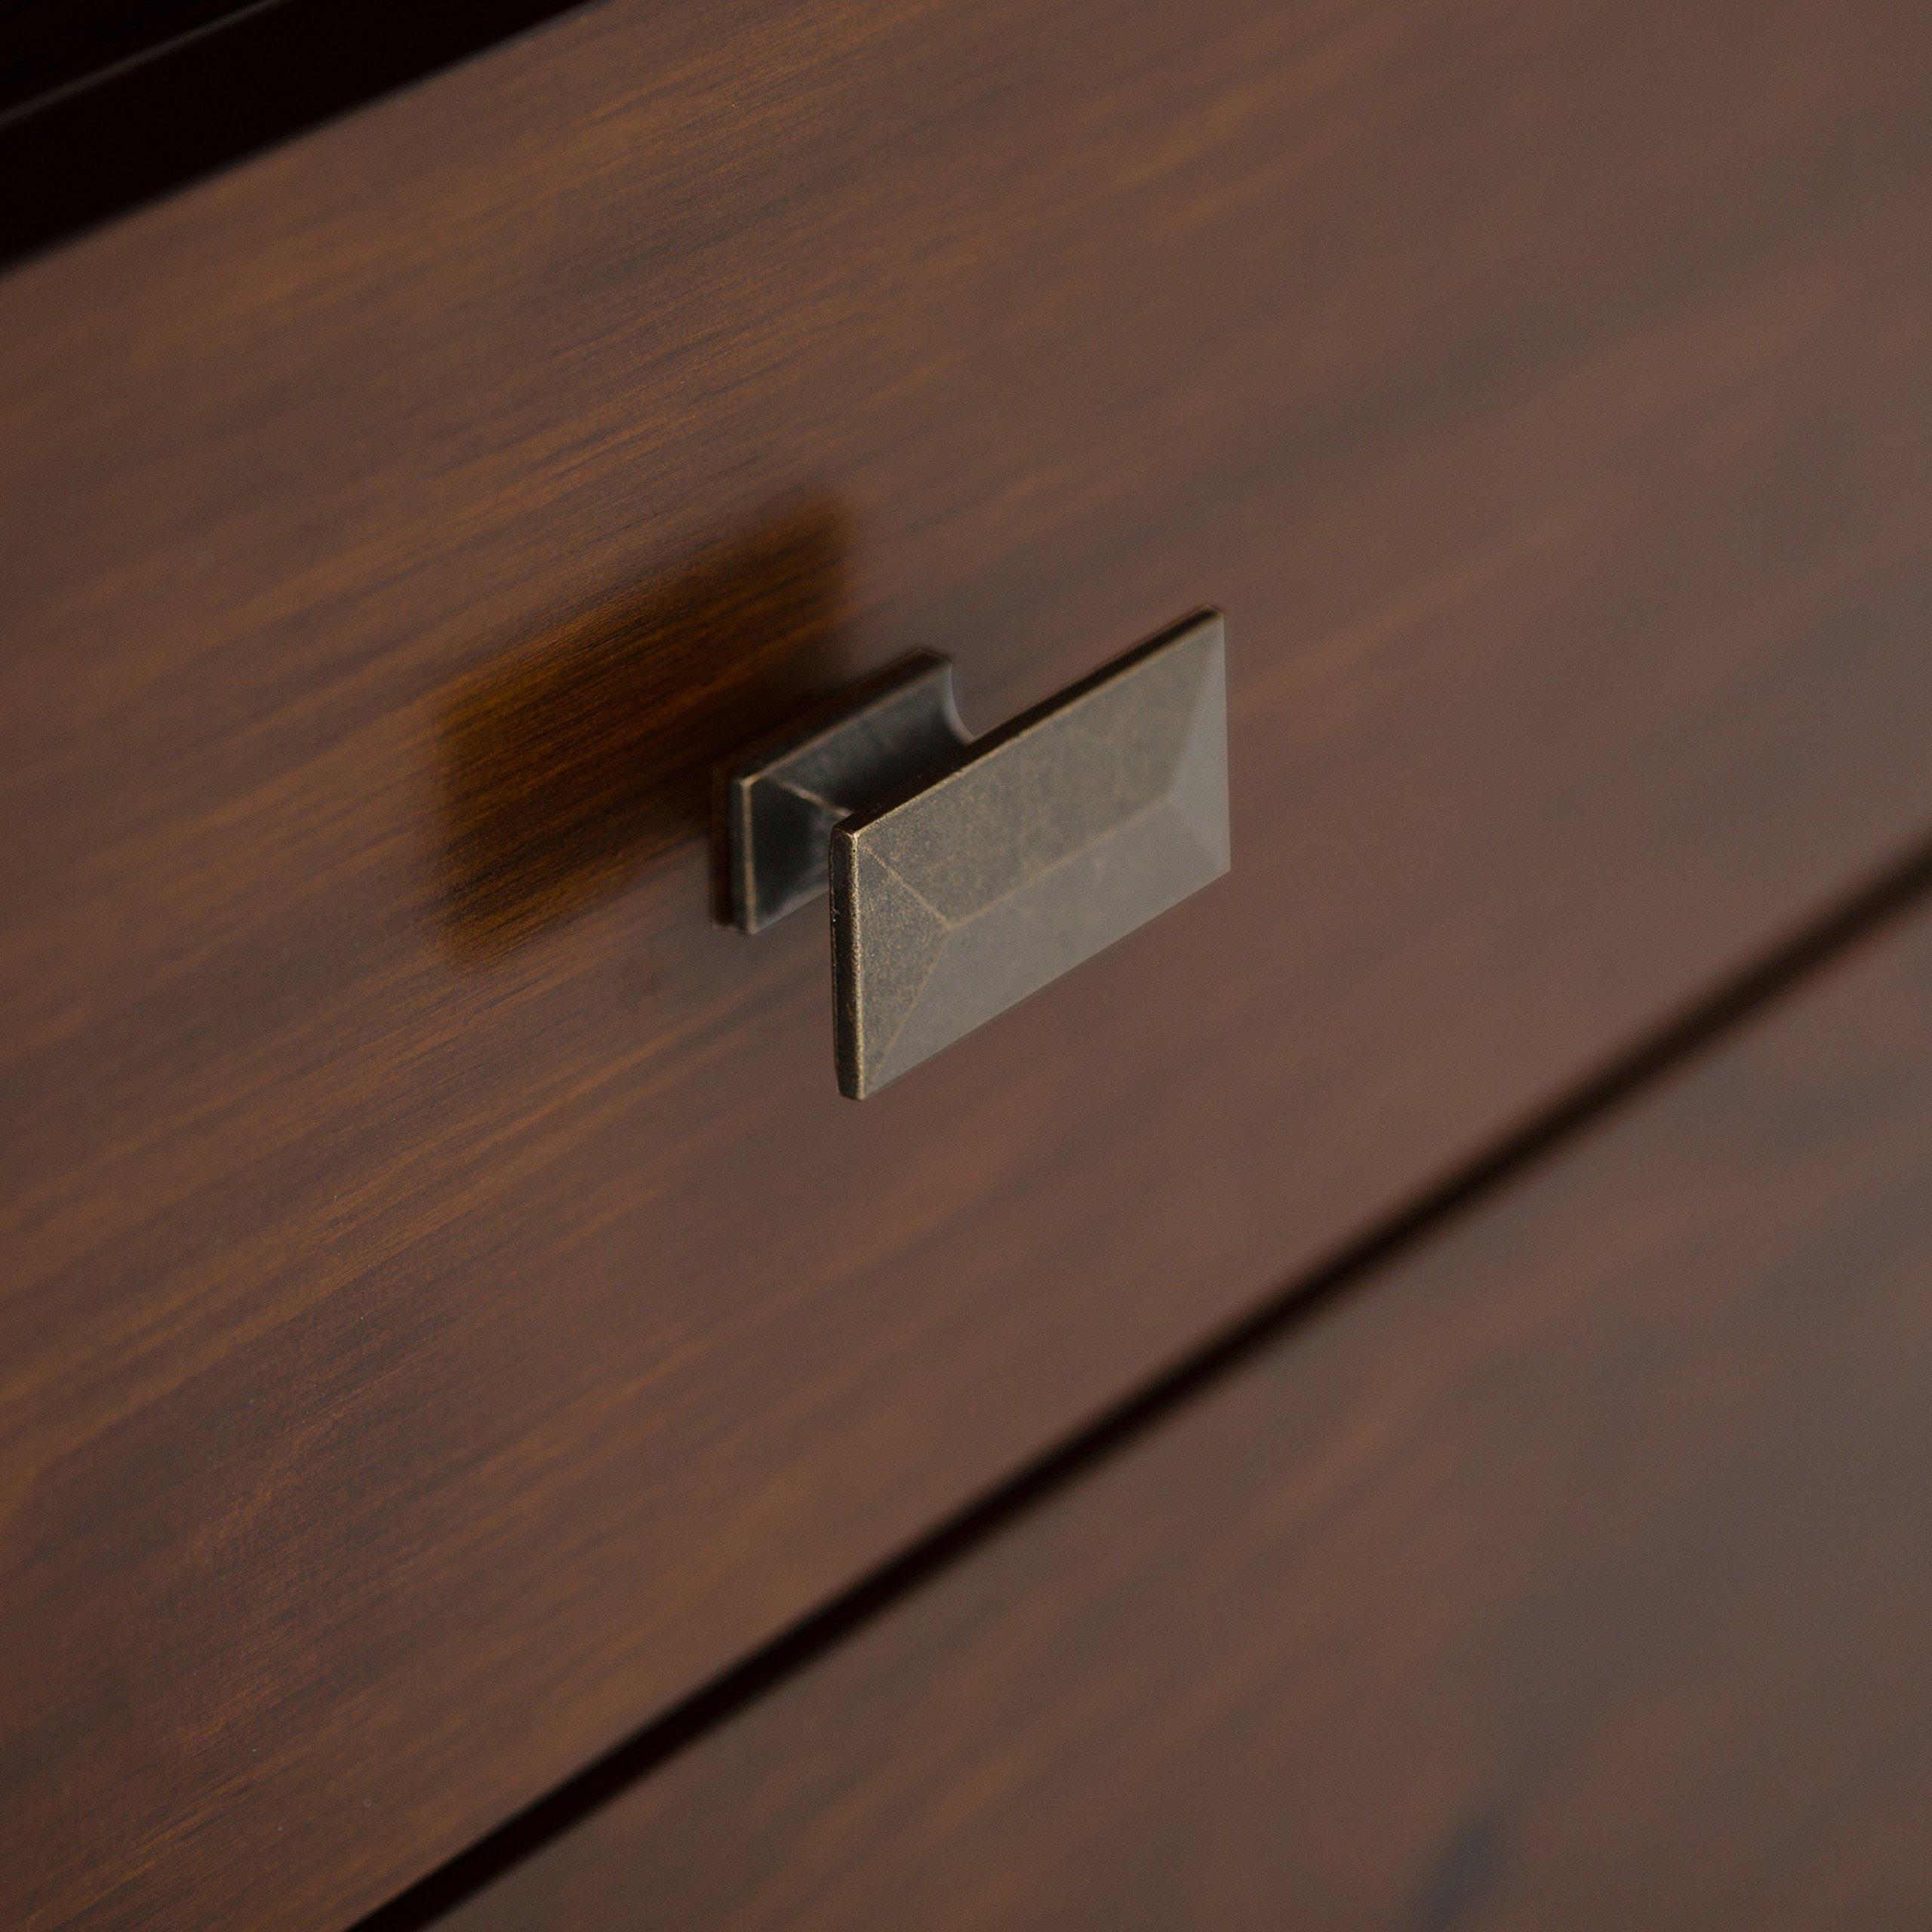 Simpli Home Artisan TV Media Stand for TVs up to 60'', Medium Auburn Brown by Simpli Home (Image #7)